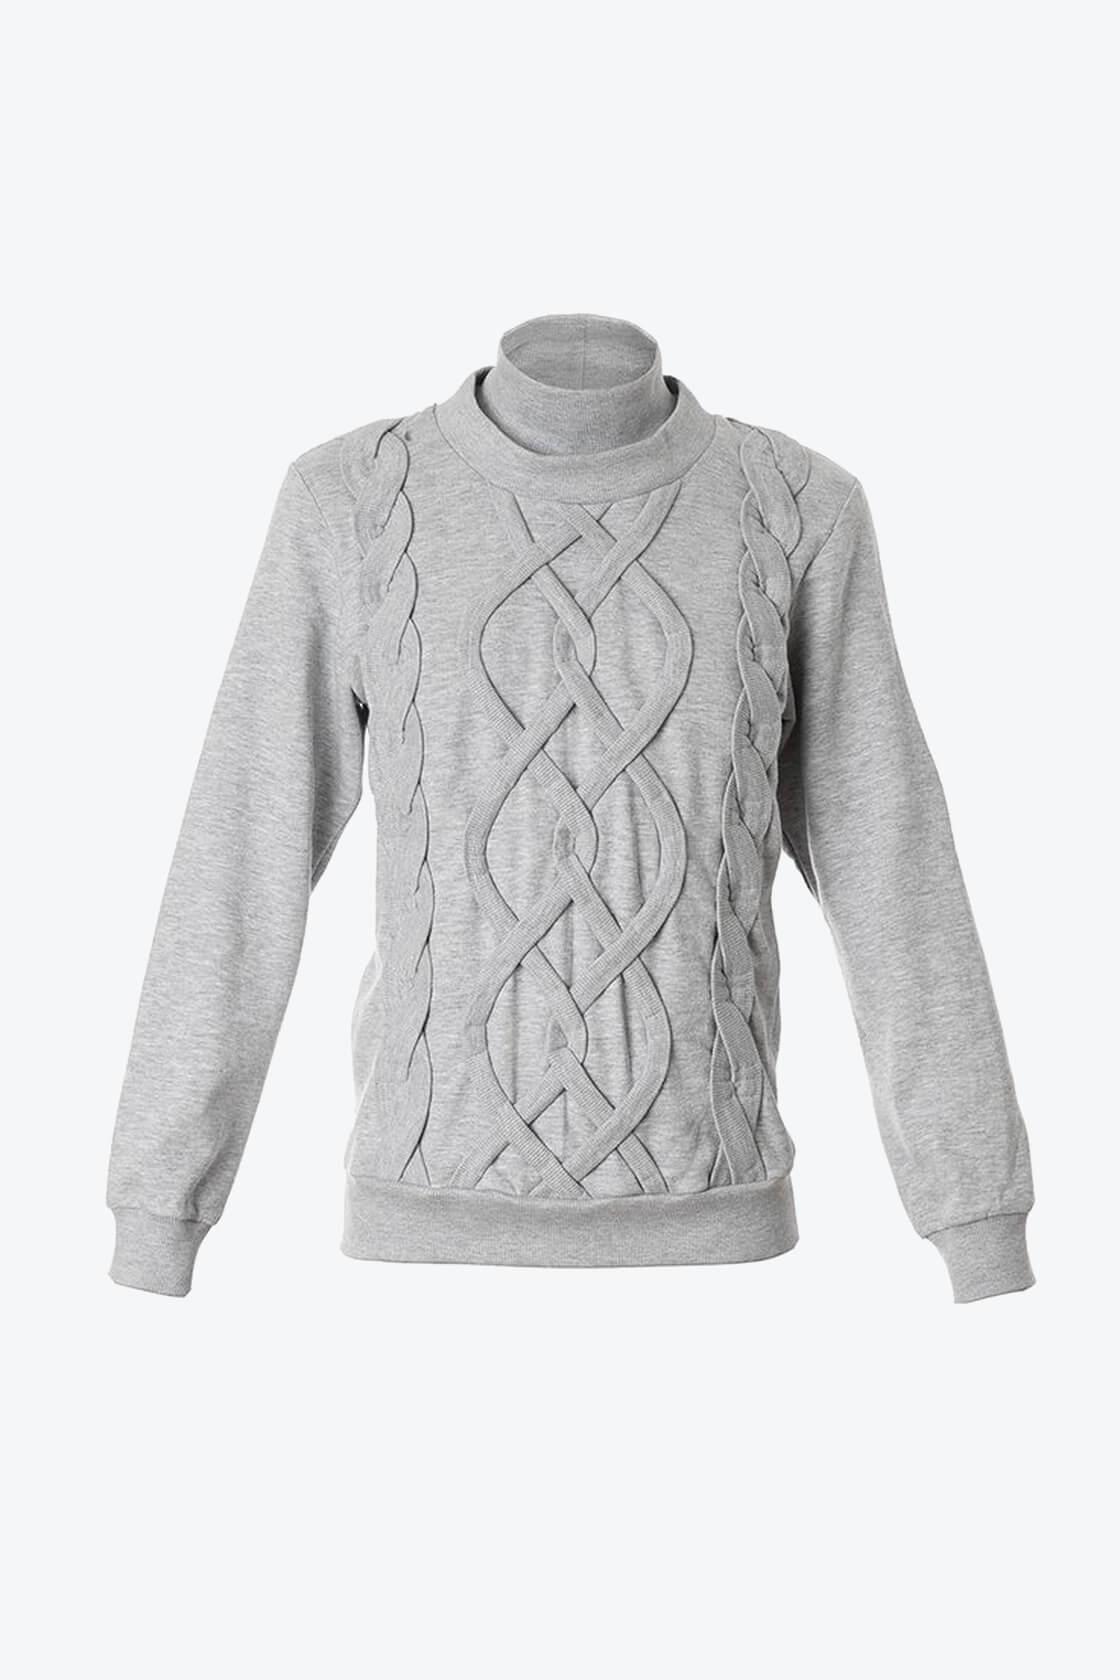 OL10000255 Fake knitwear sweatshirt1